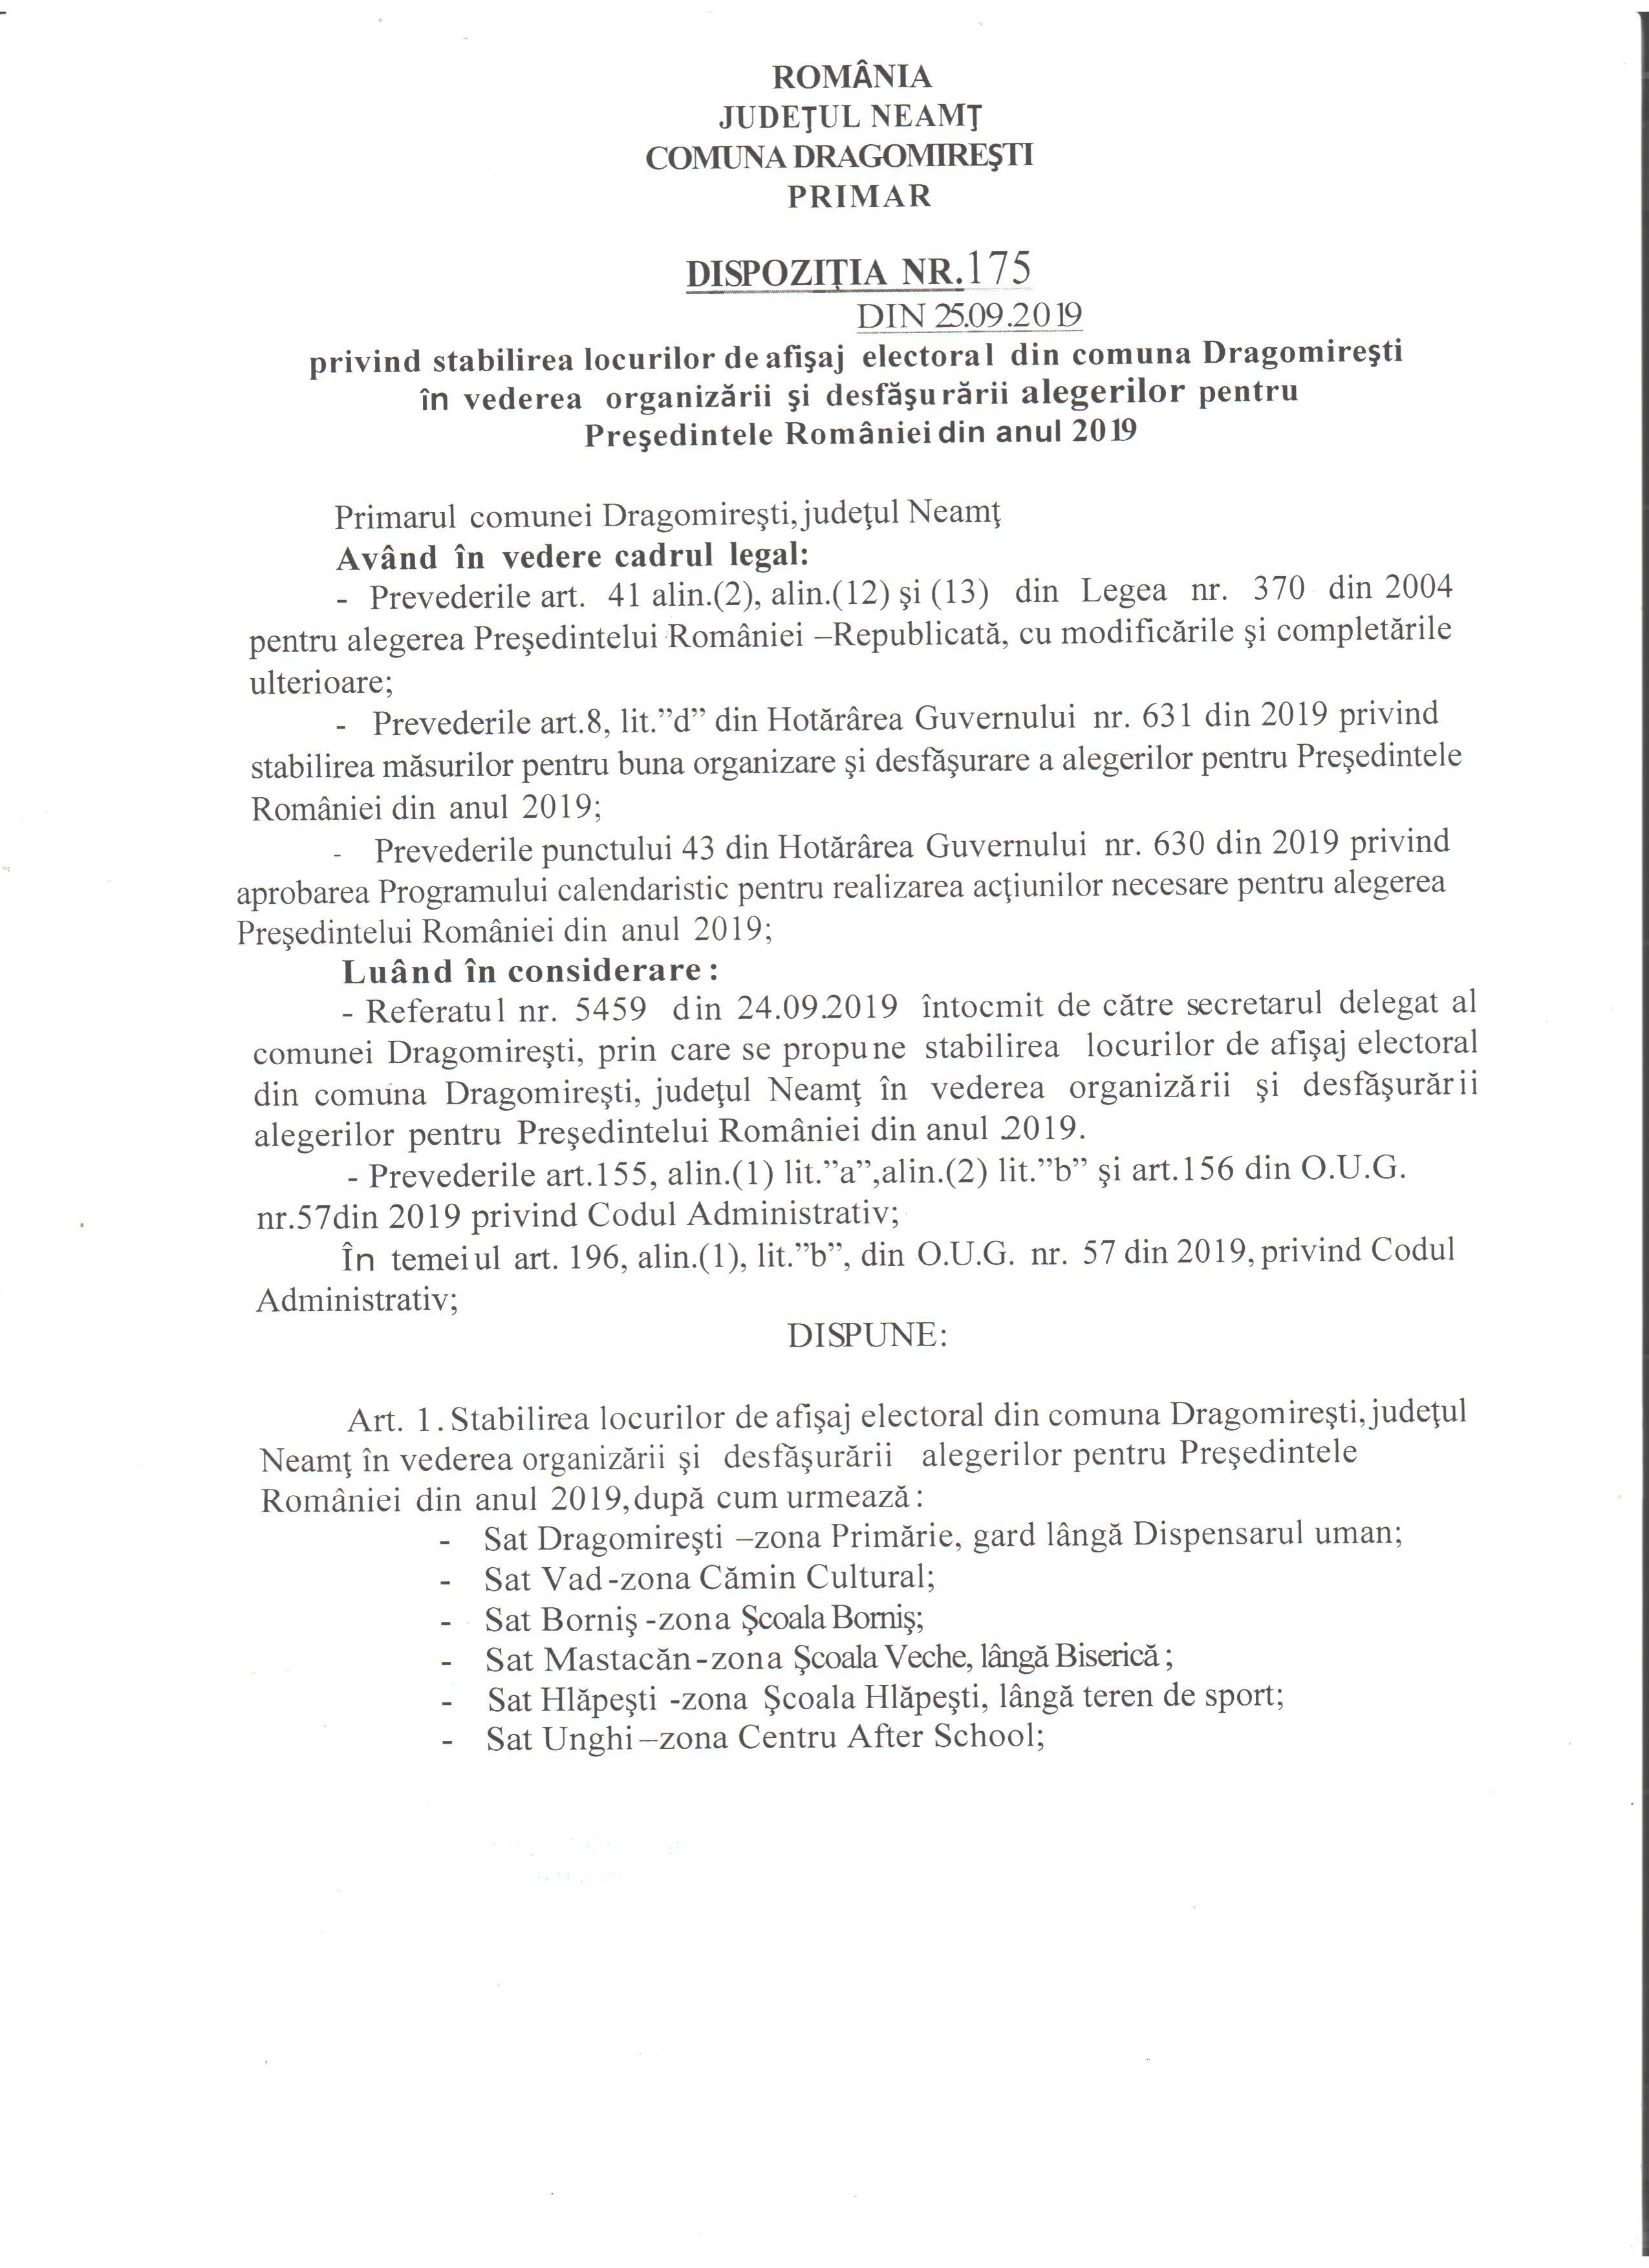 Dispozitia nr. 175 Afisaj electoral pg.1 001